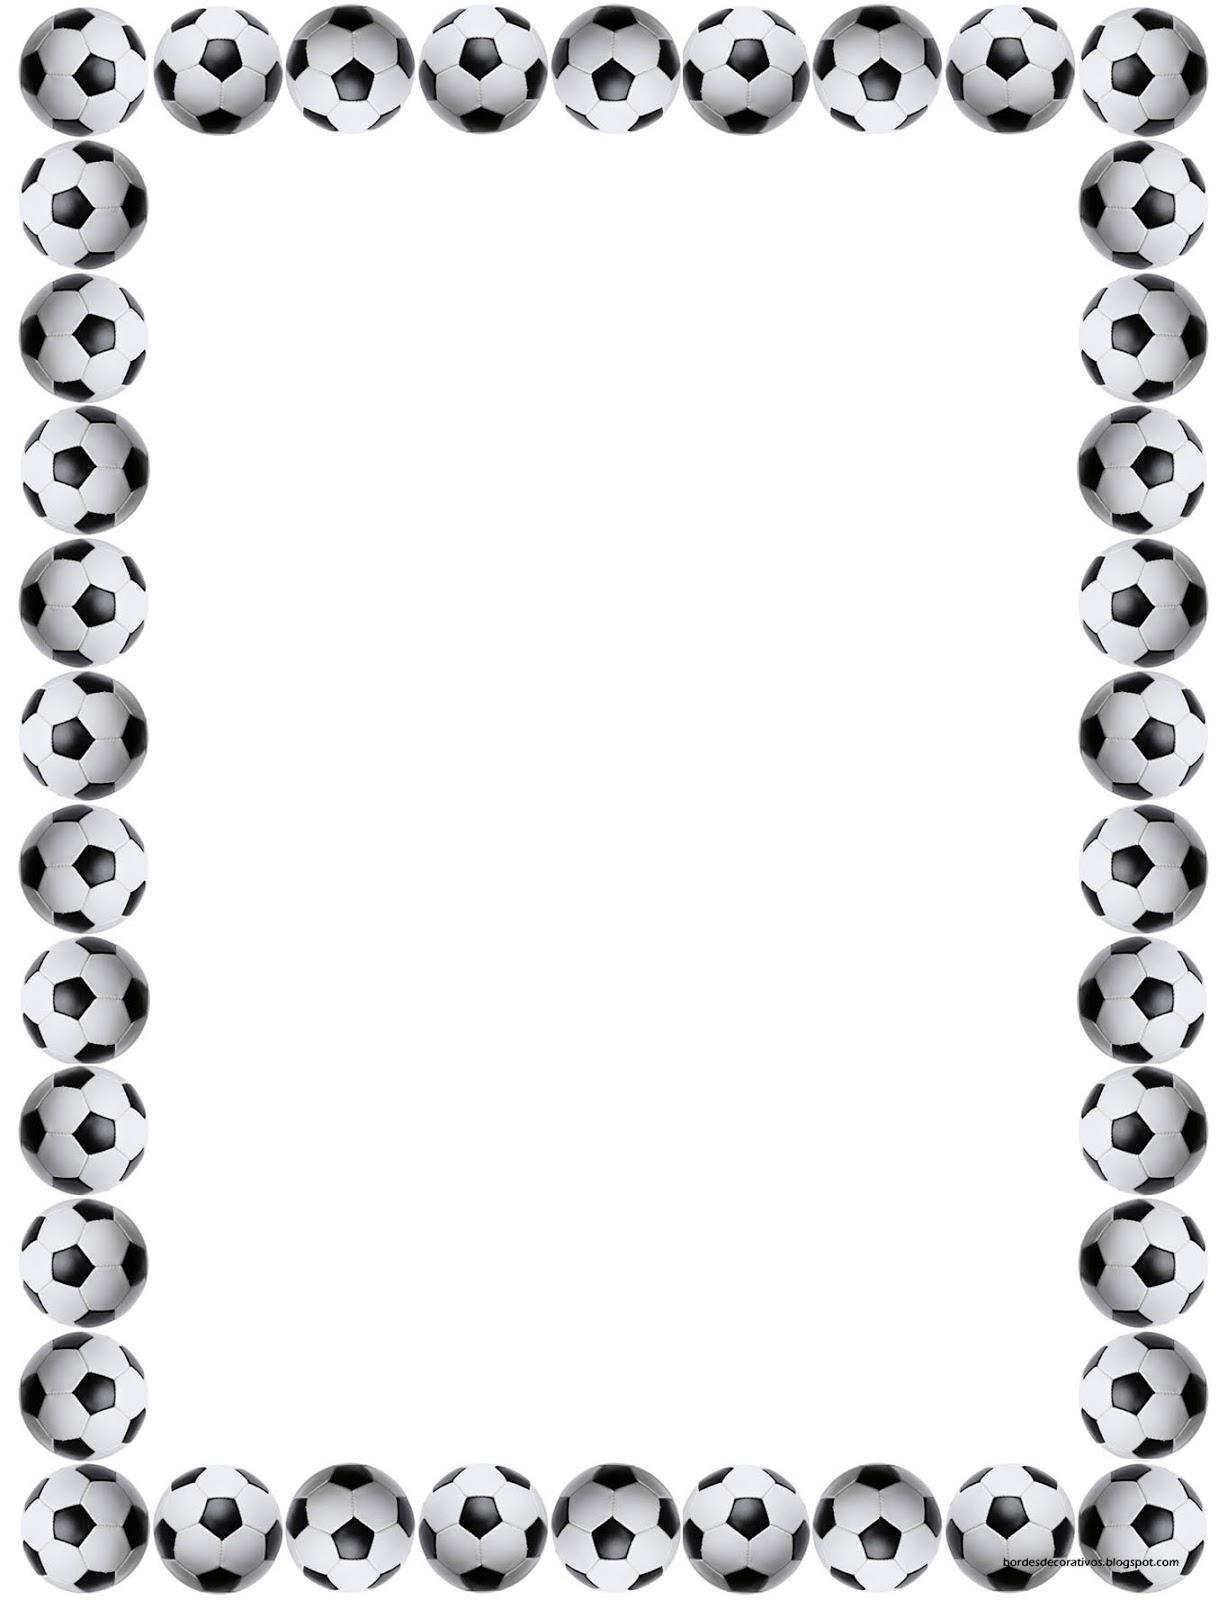 Imagenes De Pelotas De Futbol Para Imprimir - Pelota De Futbol Imágenes De Archivo Vectores 123RF